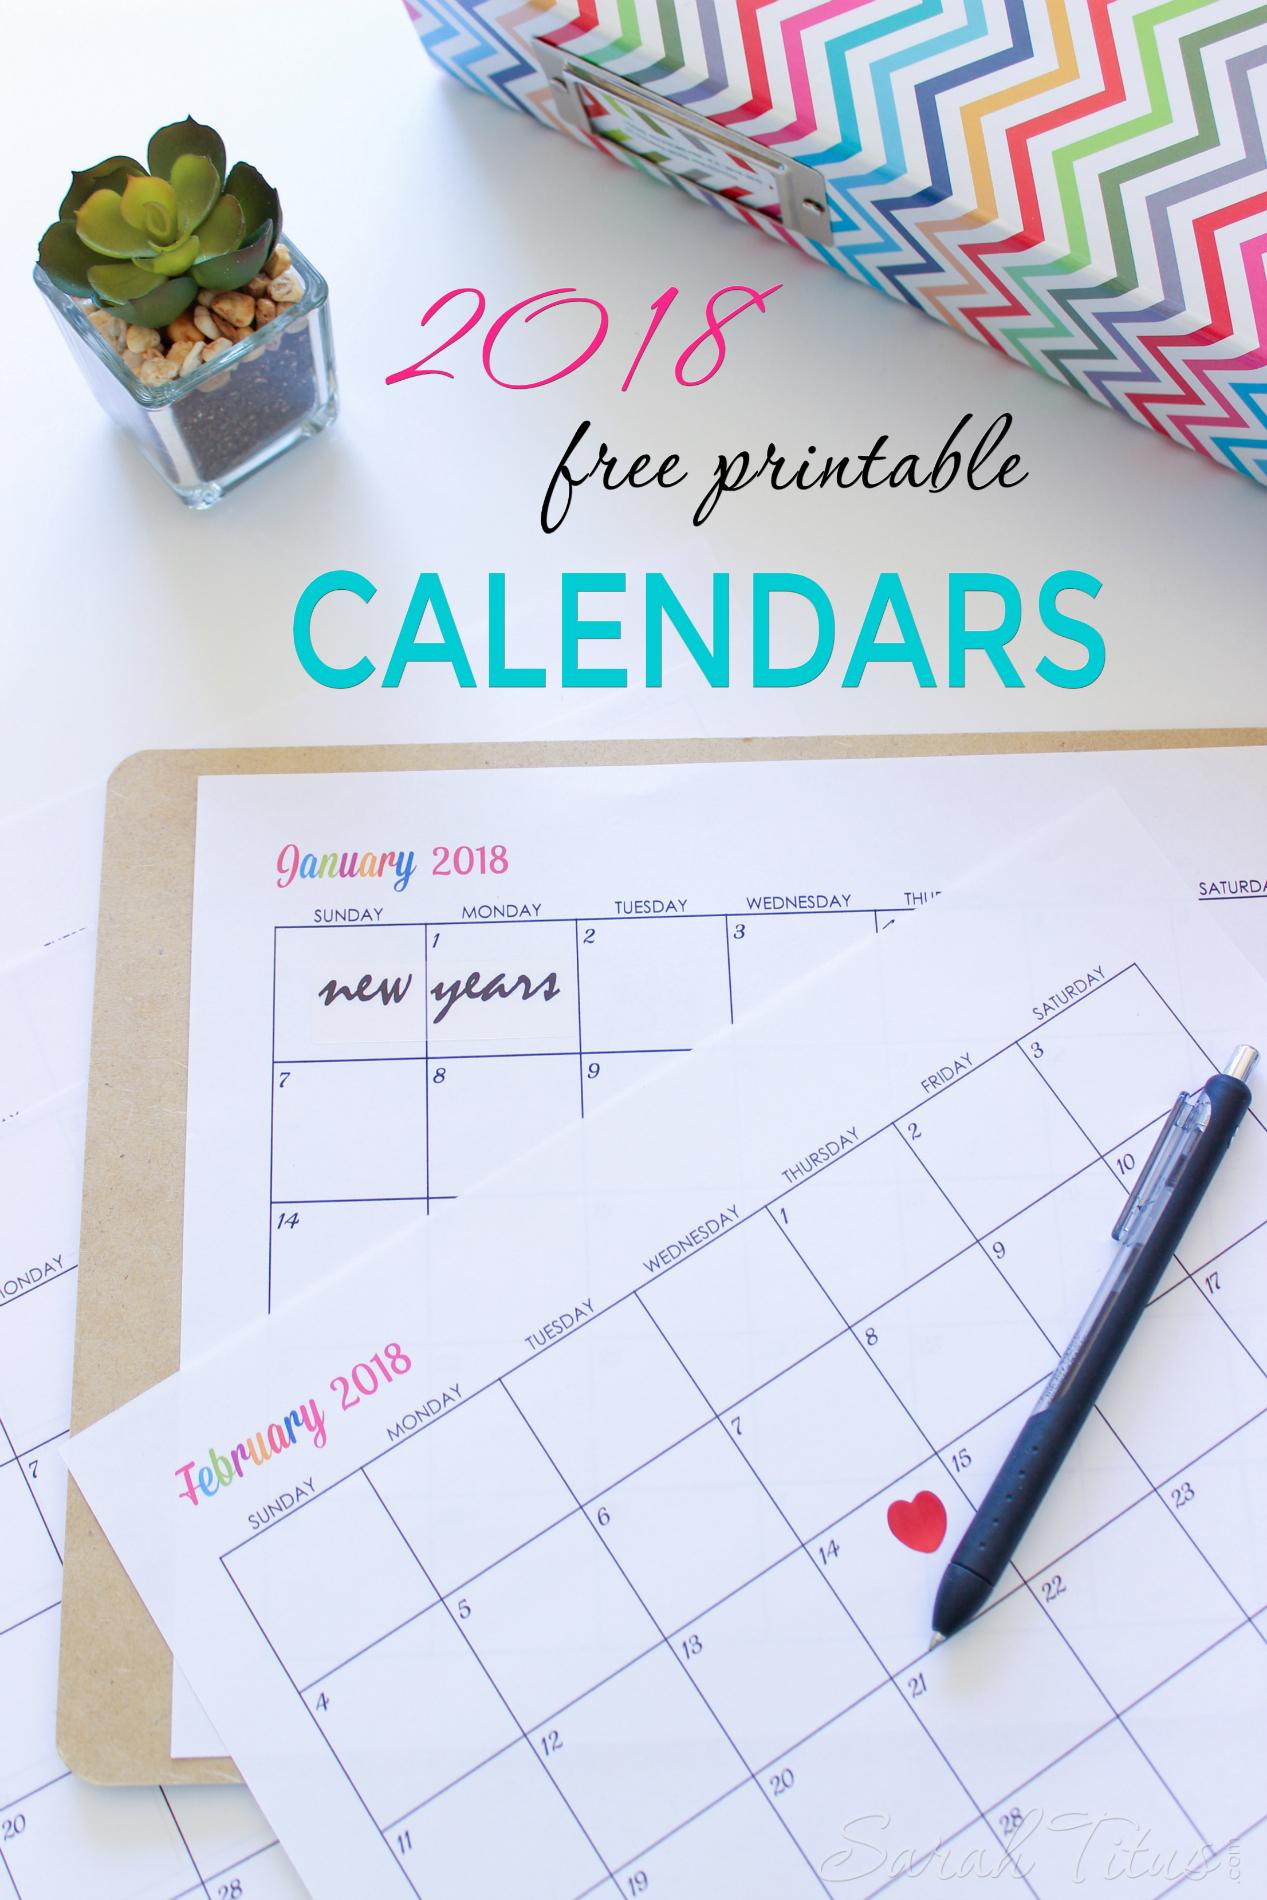 Custom Editable Free Printable 2018 Calendars - Sarah Titus - Planner 2018 Printable Free